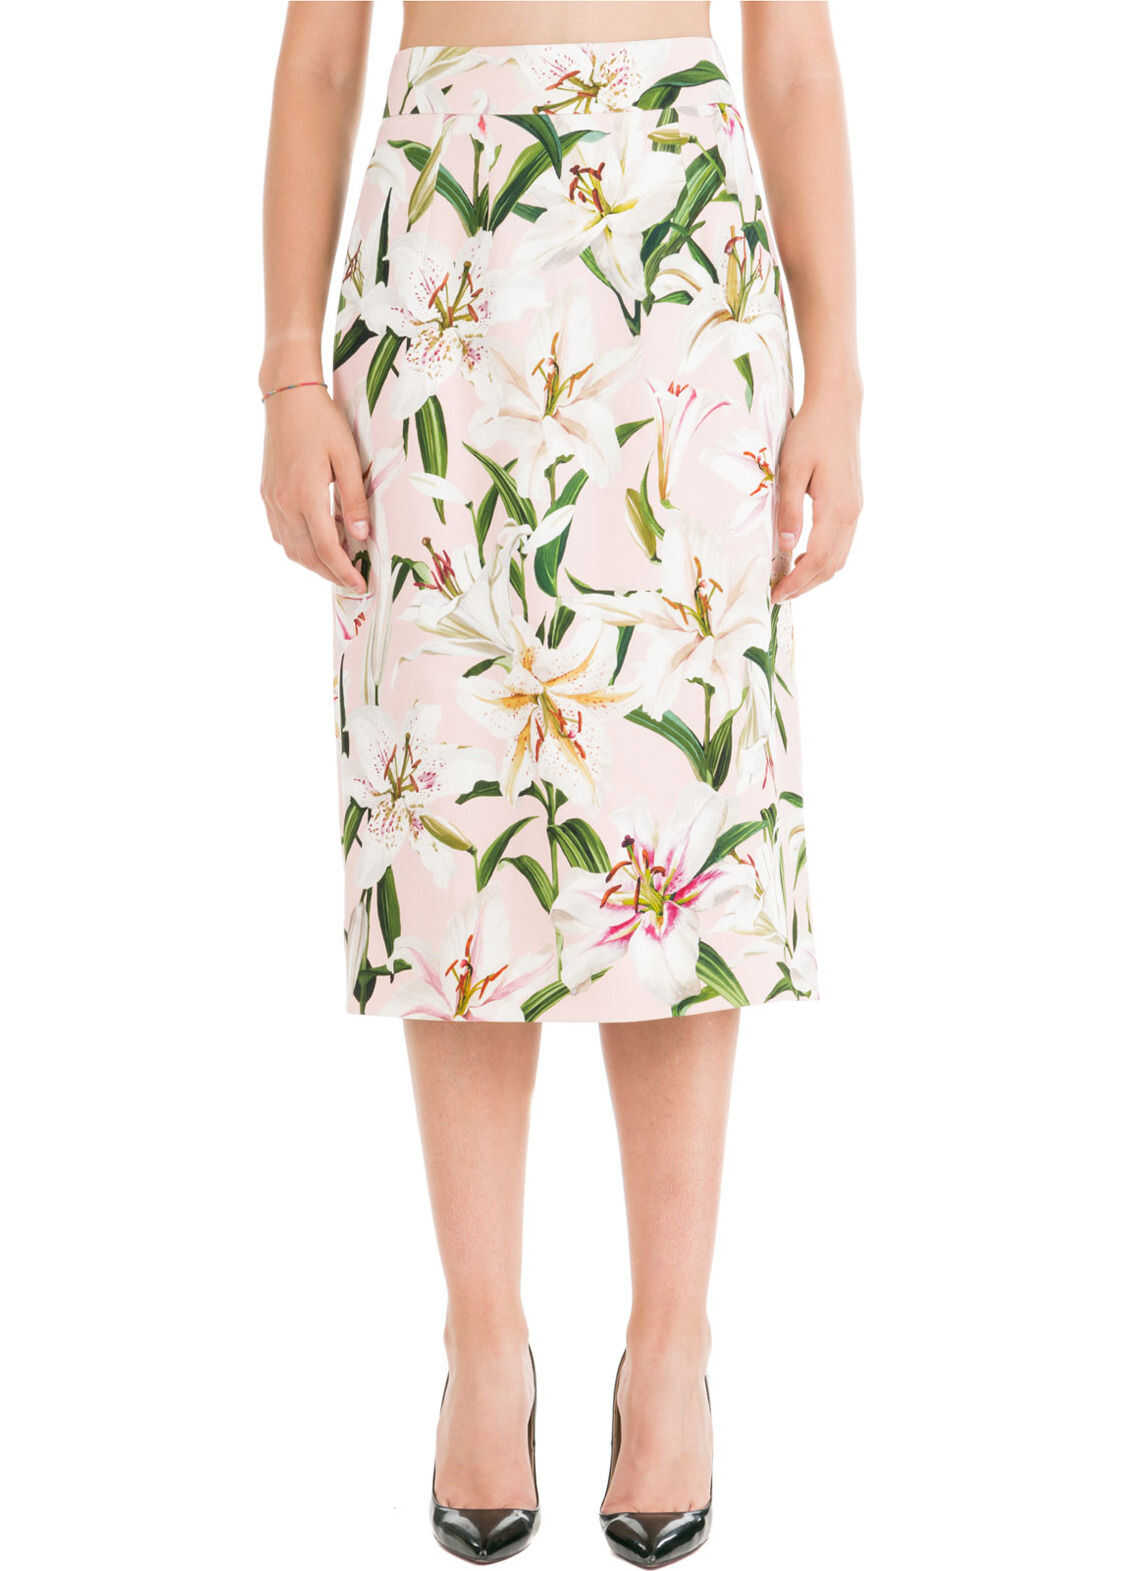 Dolce & Gabbana Skirt Longuette Pink